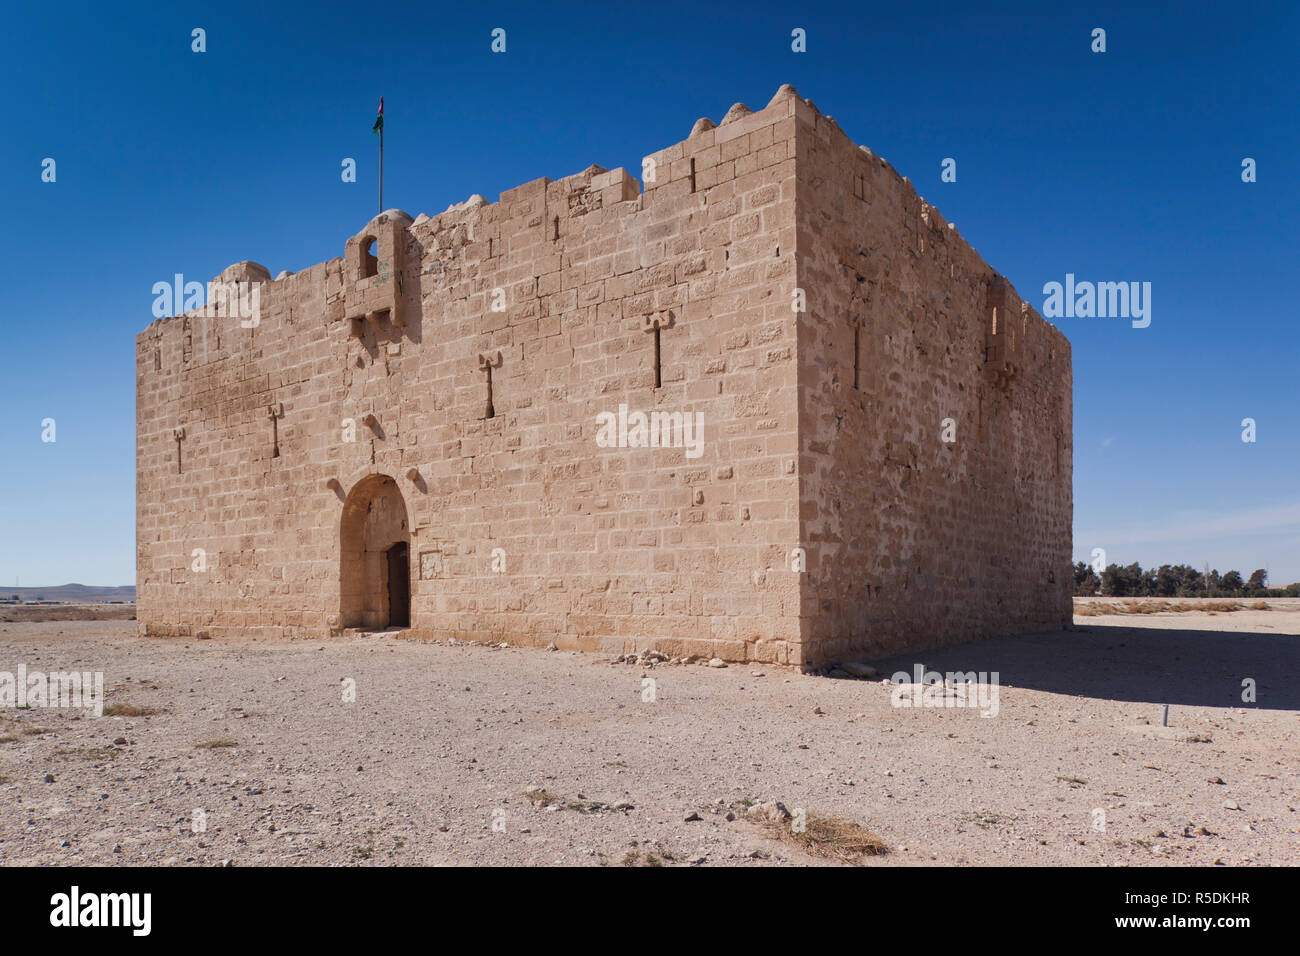 parque Natural trabajo alumno  Jordan, Desert Highway, Qatrana, Qatrana Castle, built by the Orttomans in  1531 AD Stock Photo - Alamy